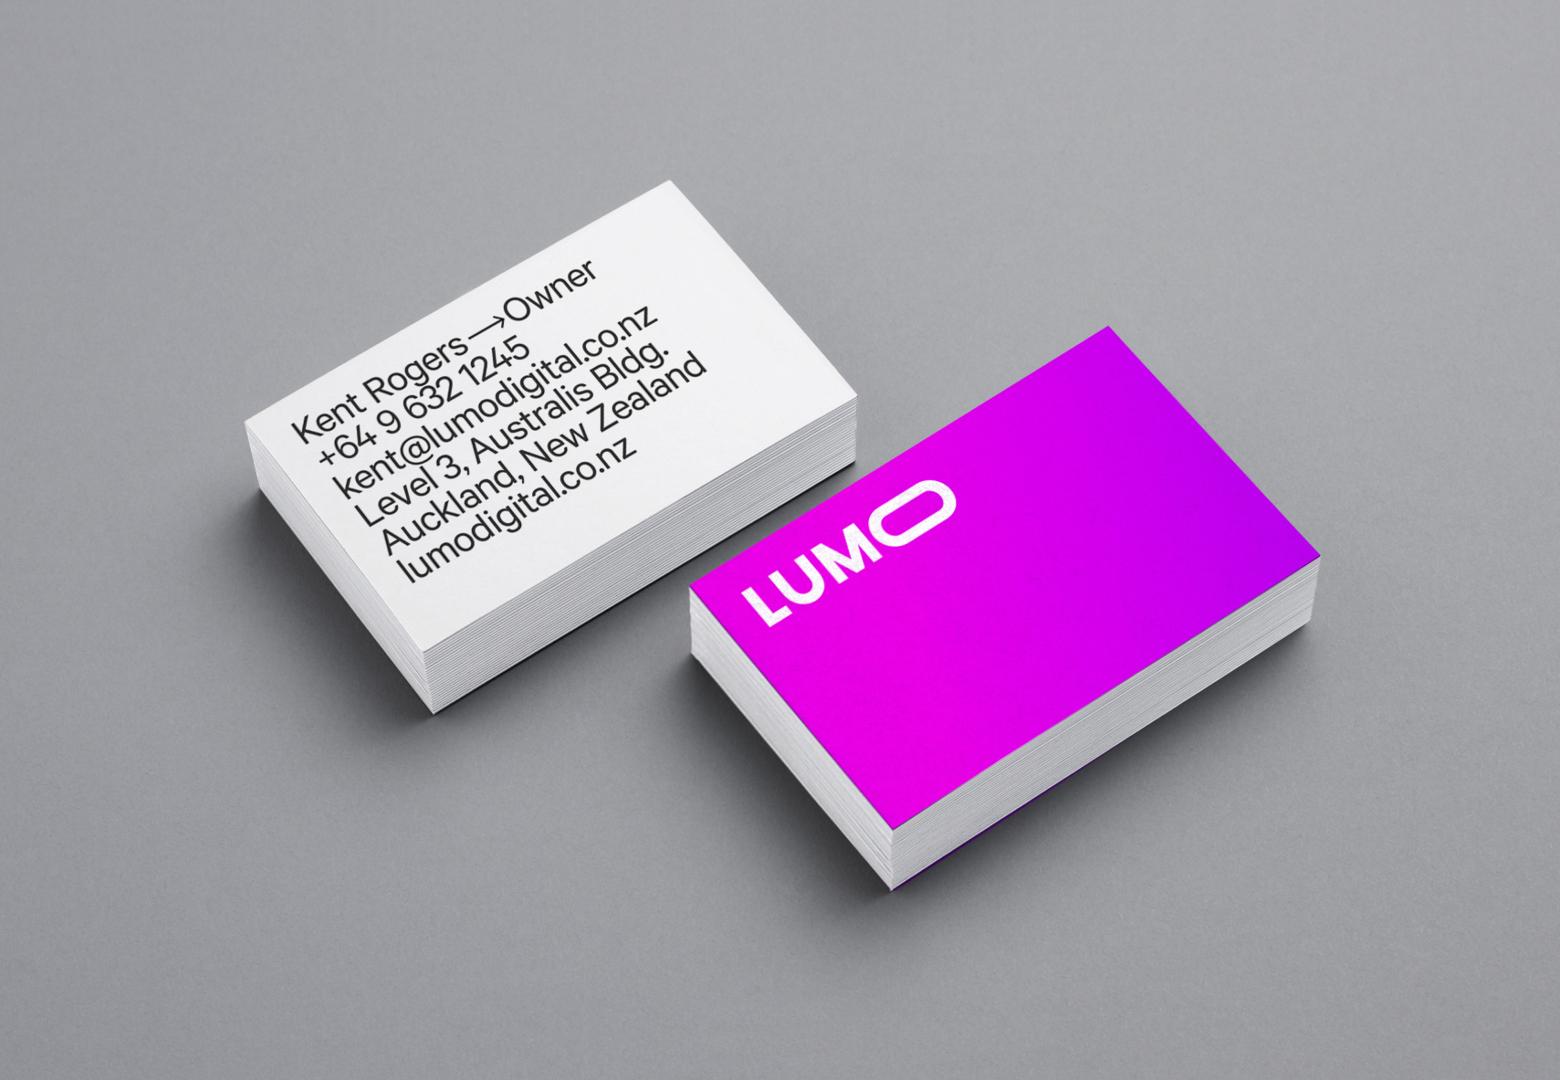 OLLIECO_Lumo-Digital-2_1560x1080